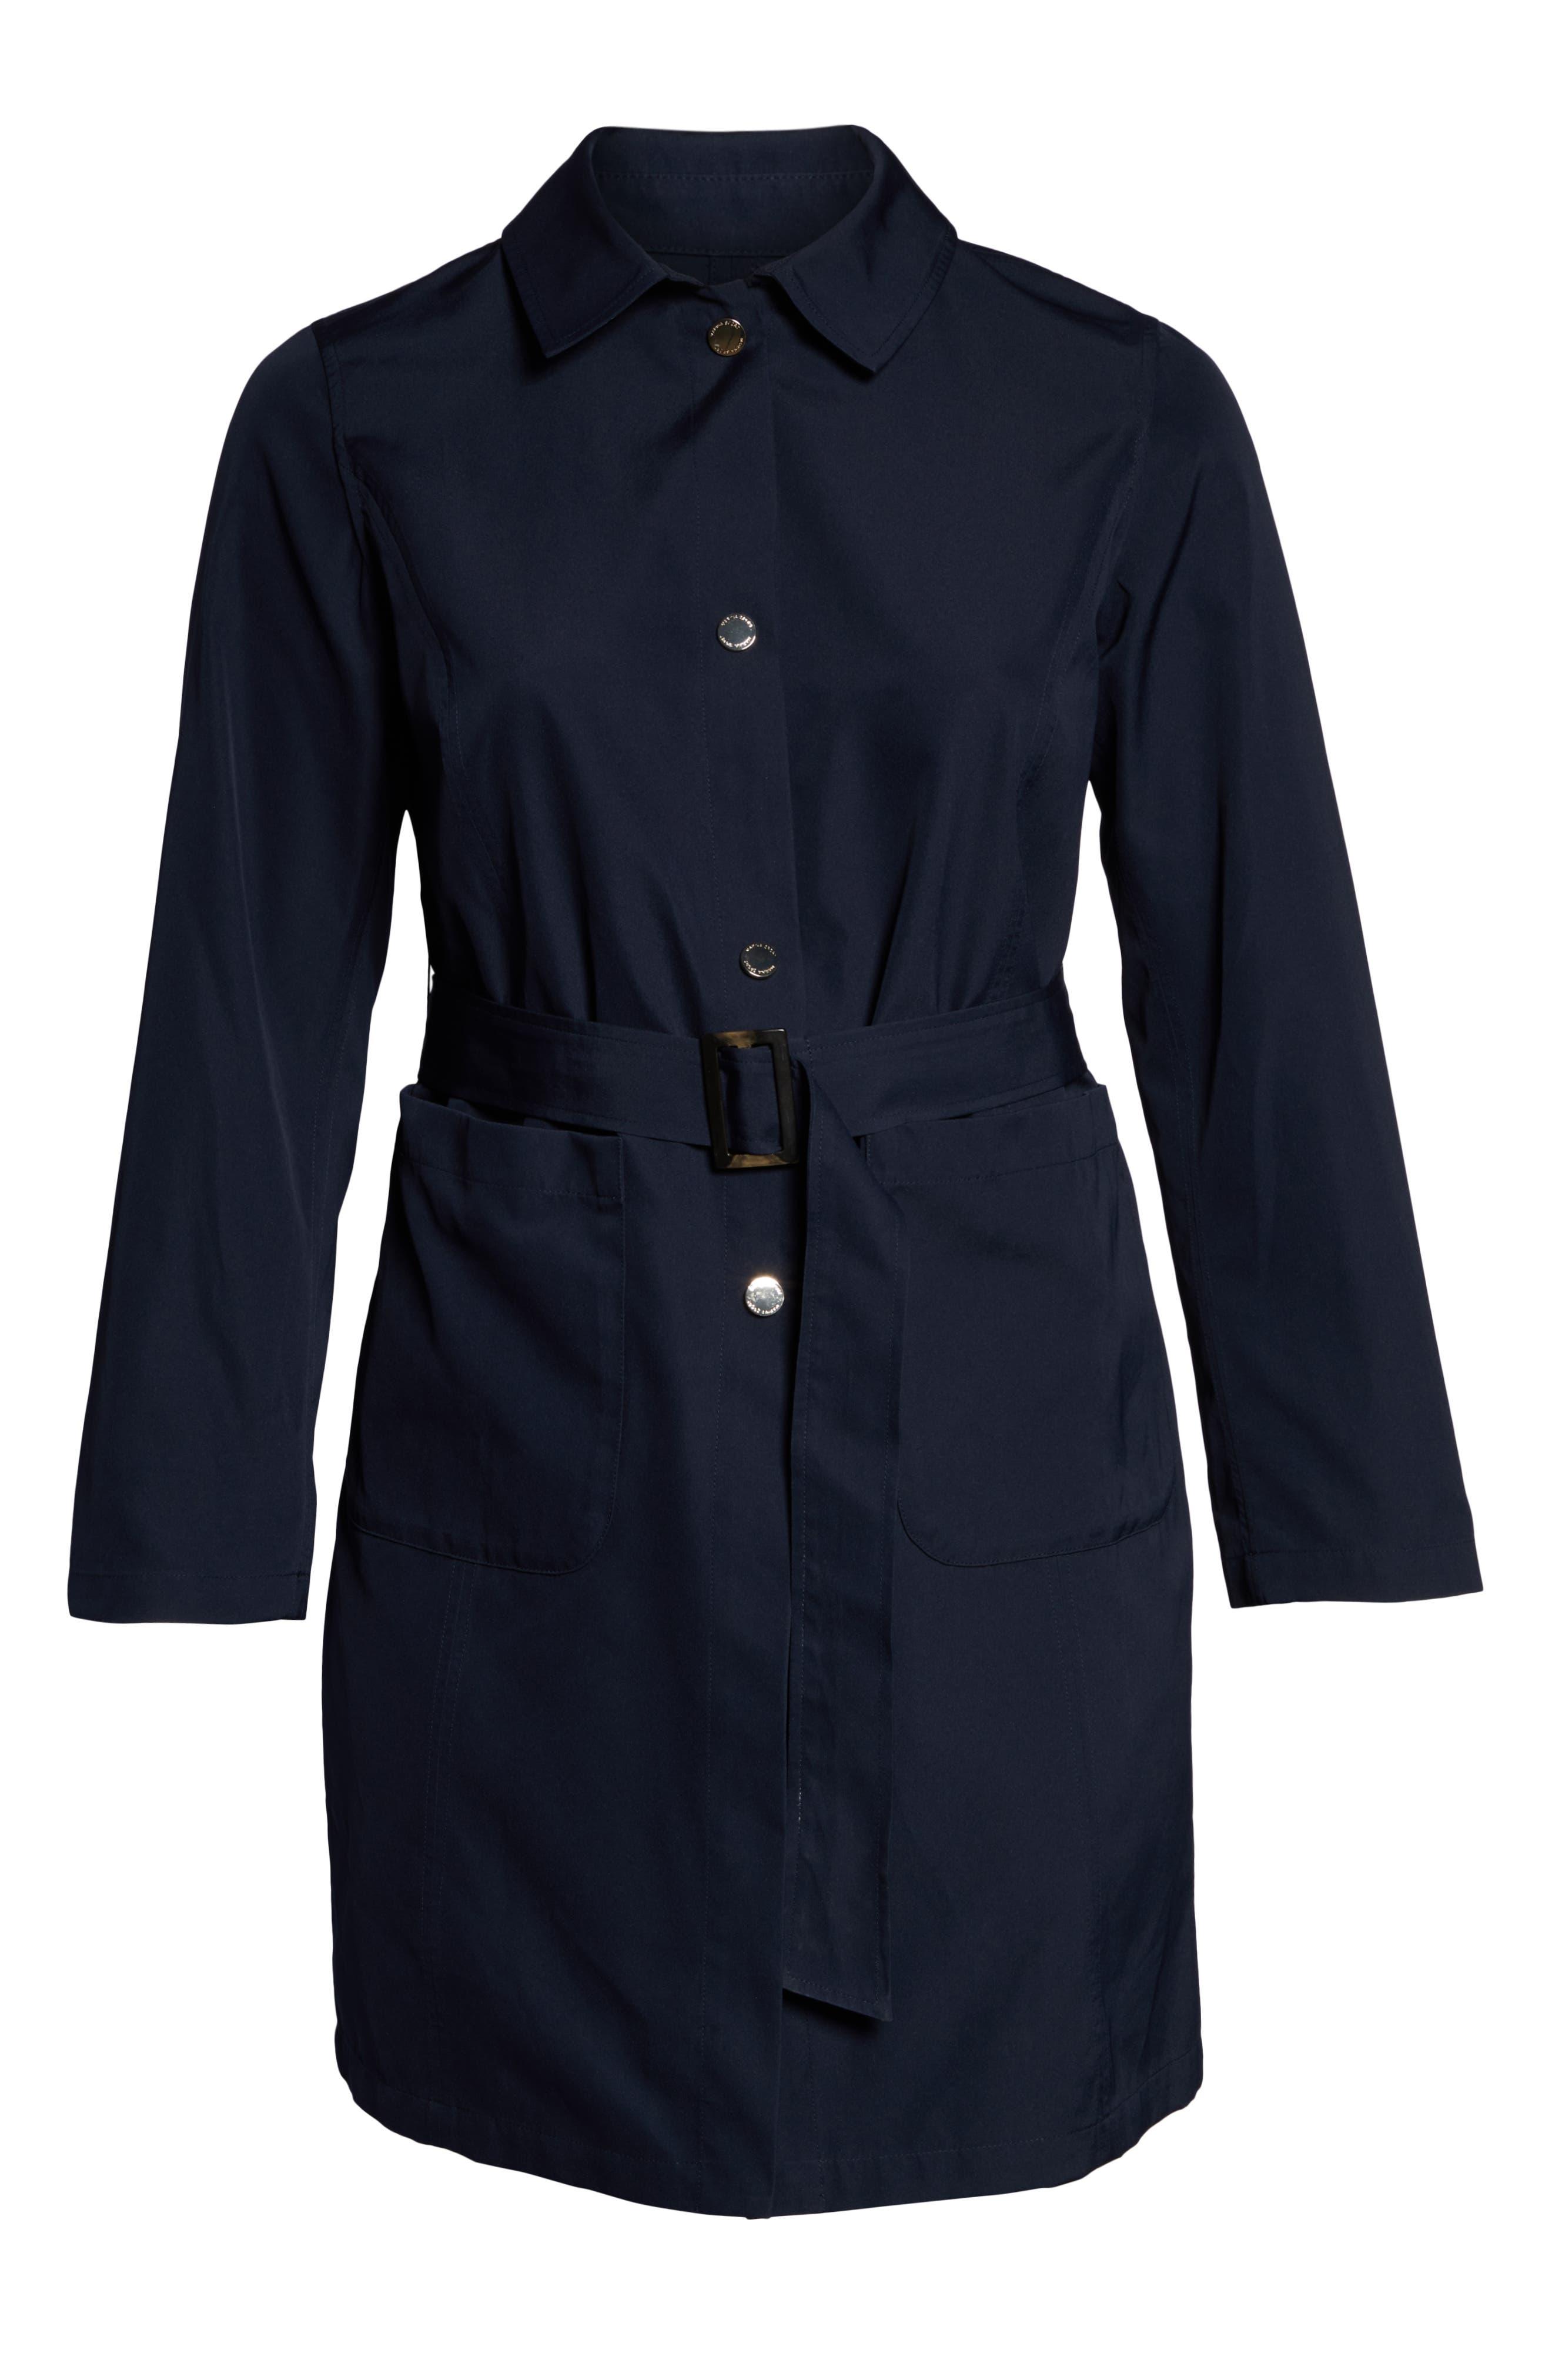 Tabella Reversible Raincoat,                             Alternate thumbnail 6, color,                             NAVY BLUE